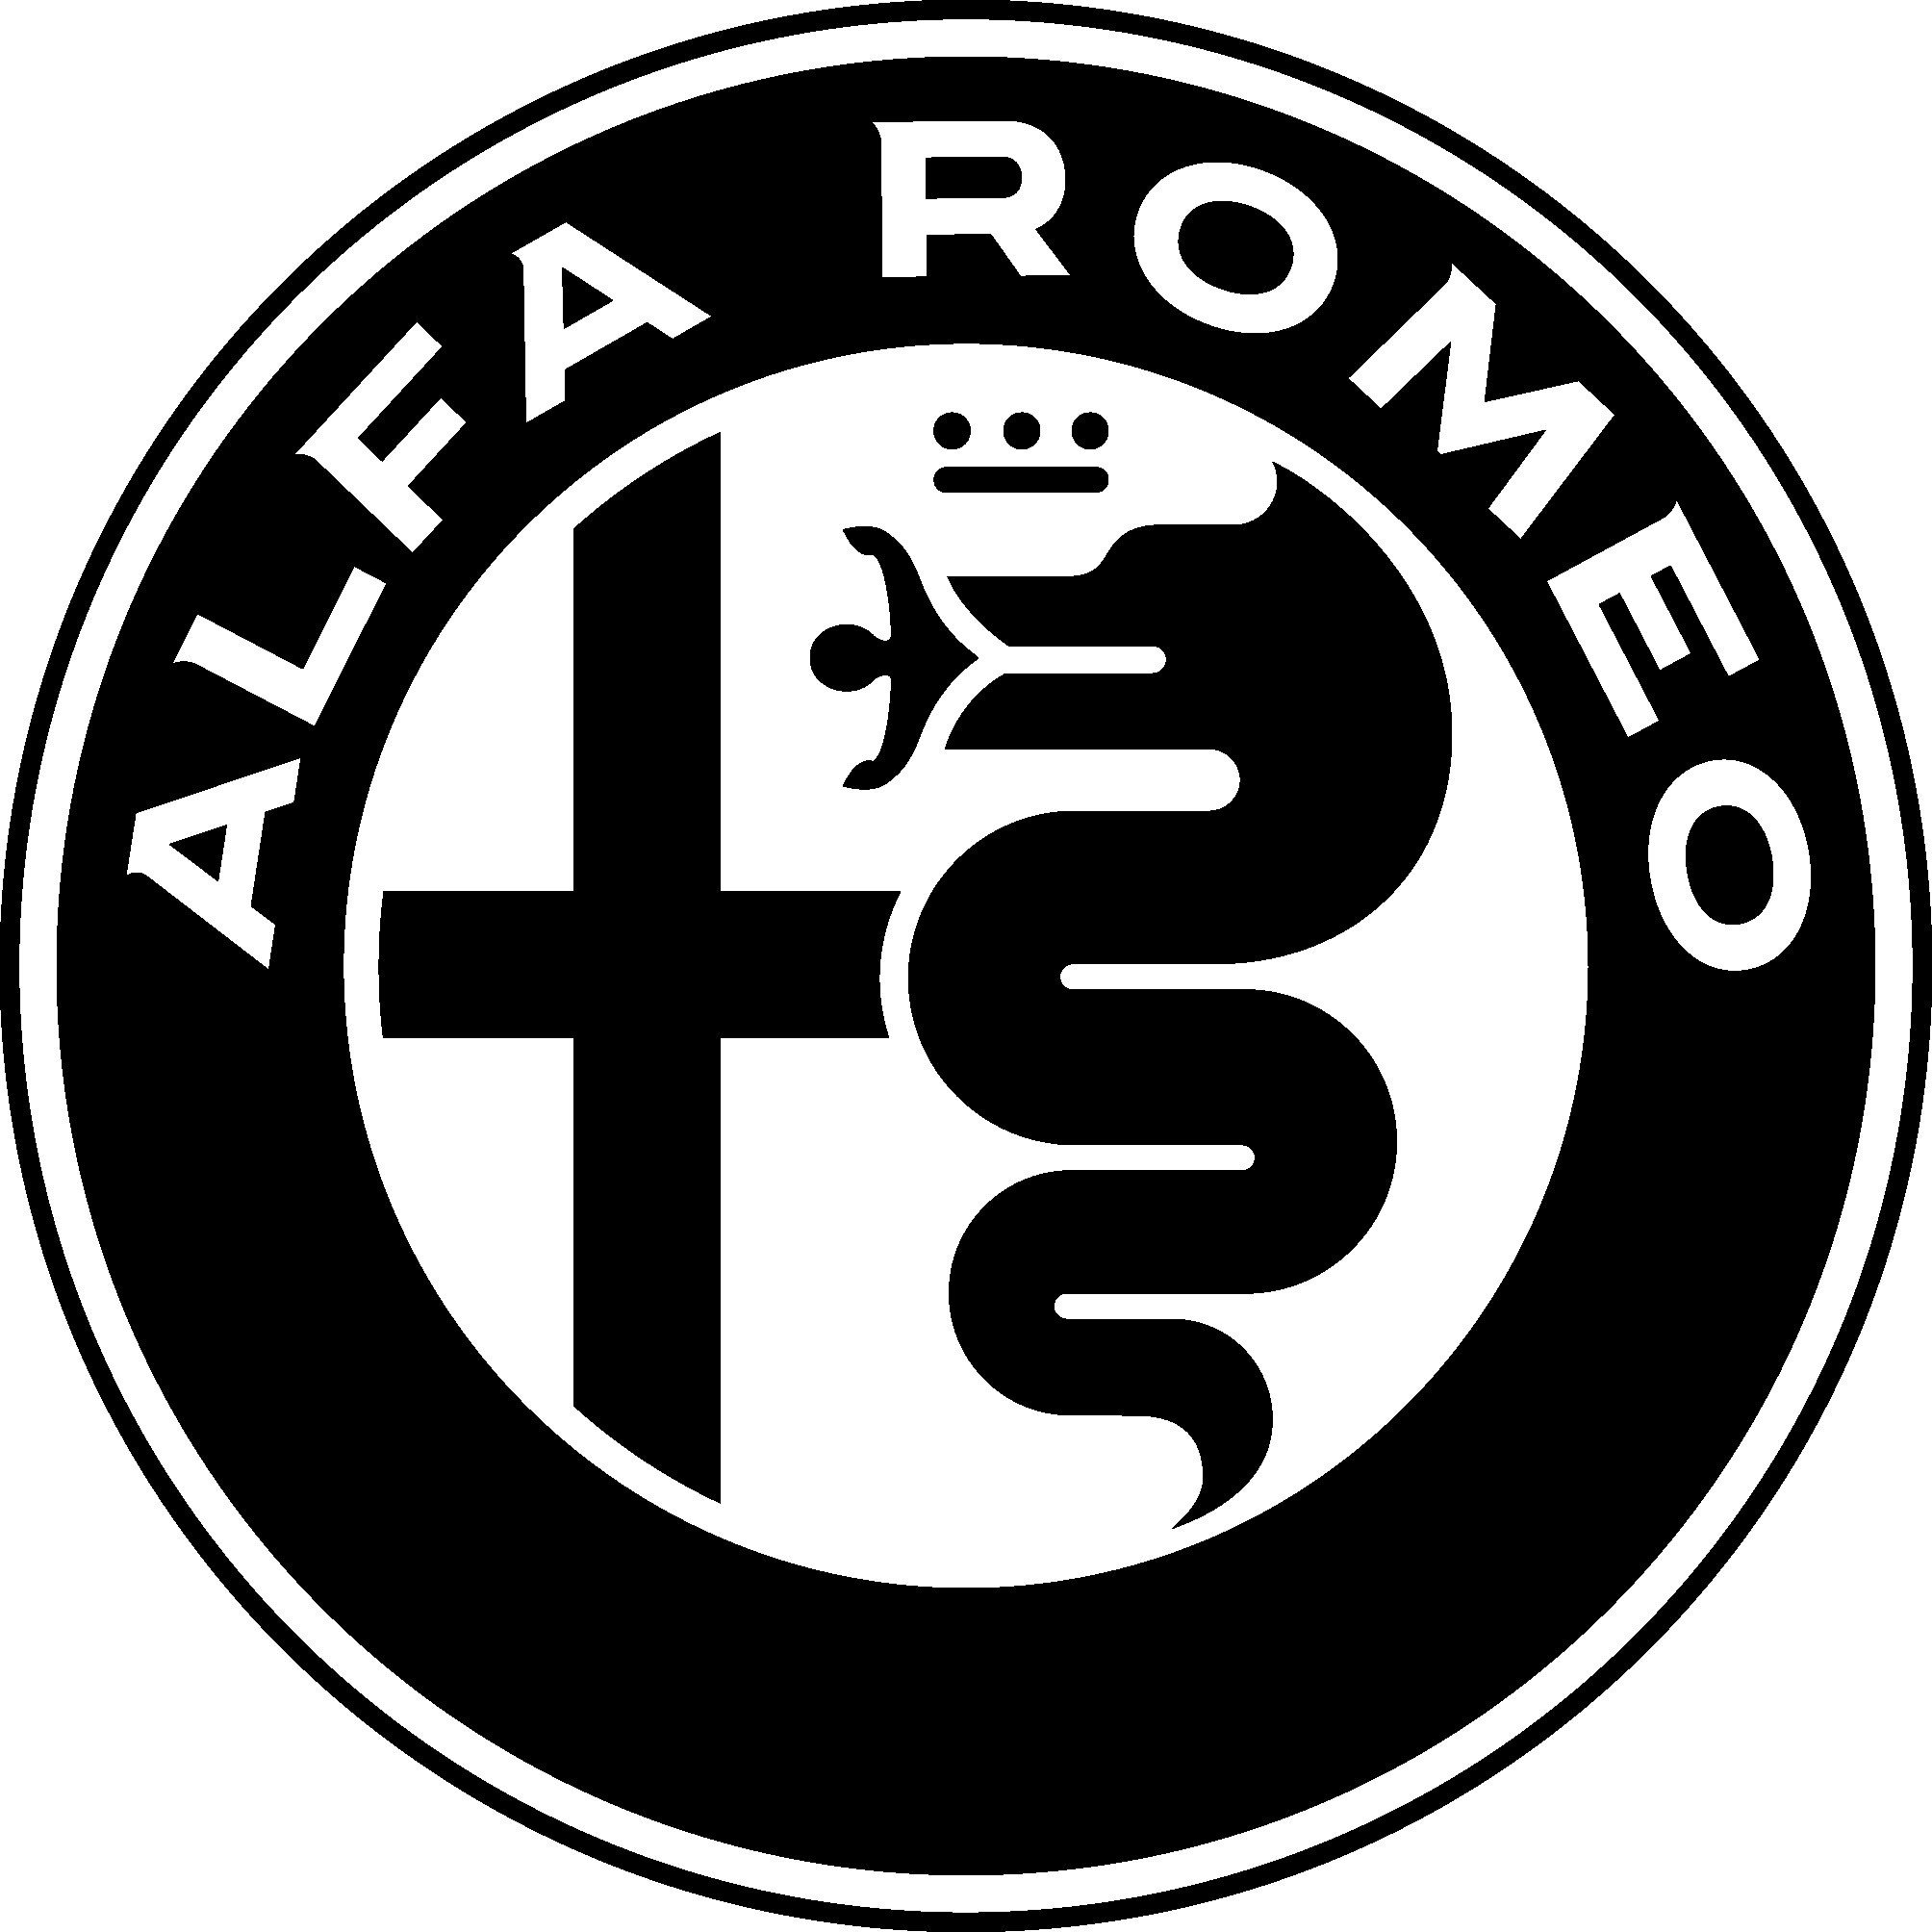 alfa-romeo-logo-new1.png